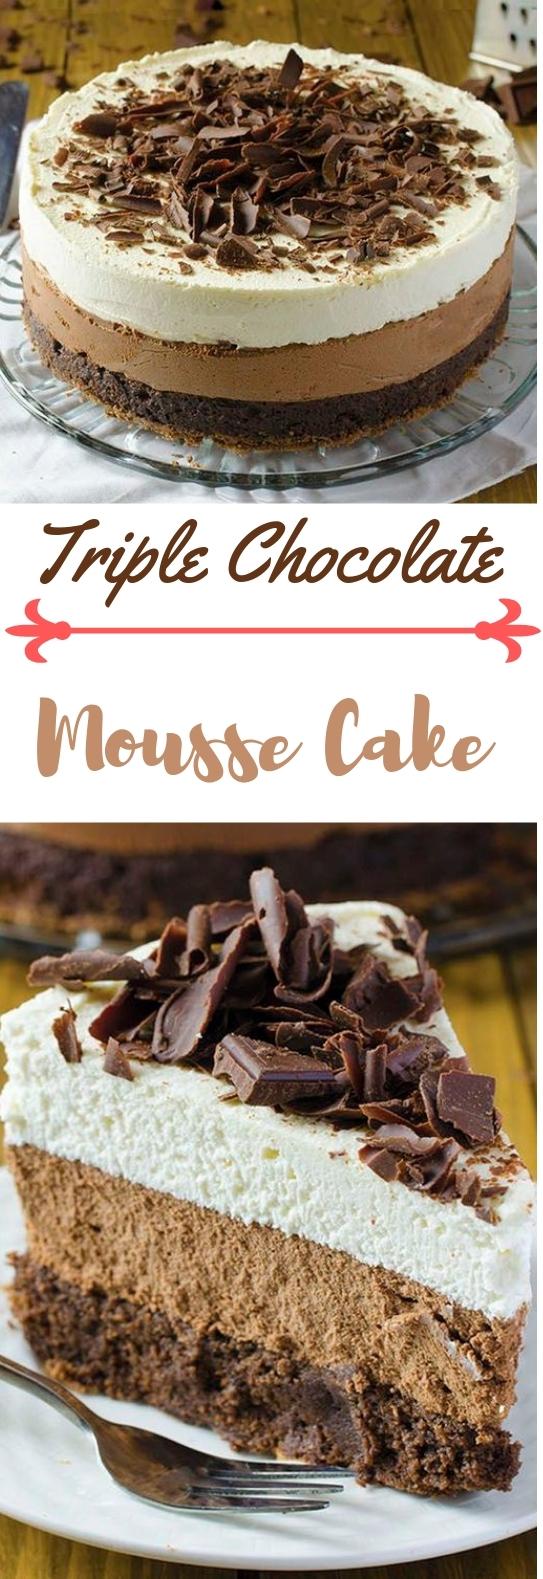 Triple Chocolate Mousse Cake Recipe #cake #chocolate